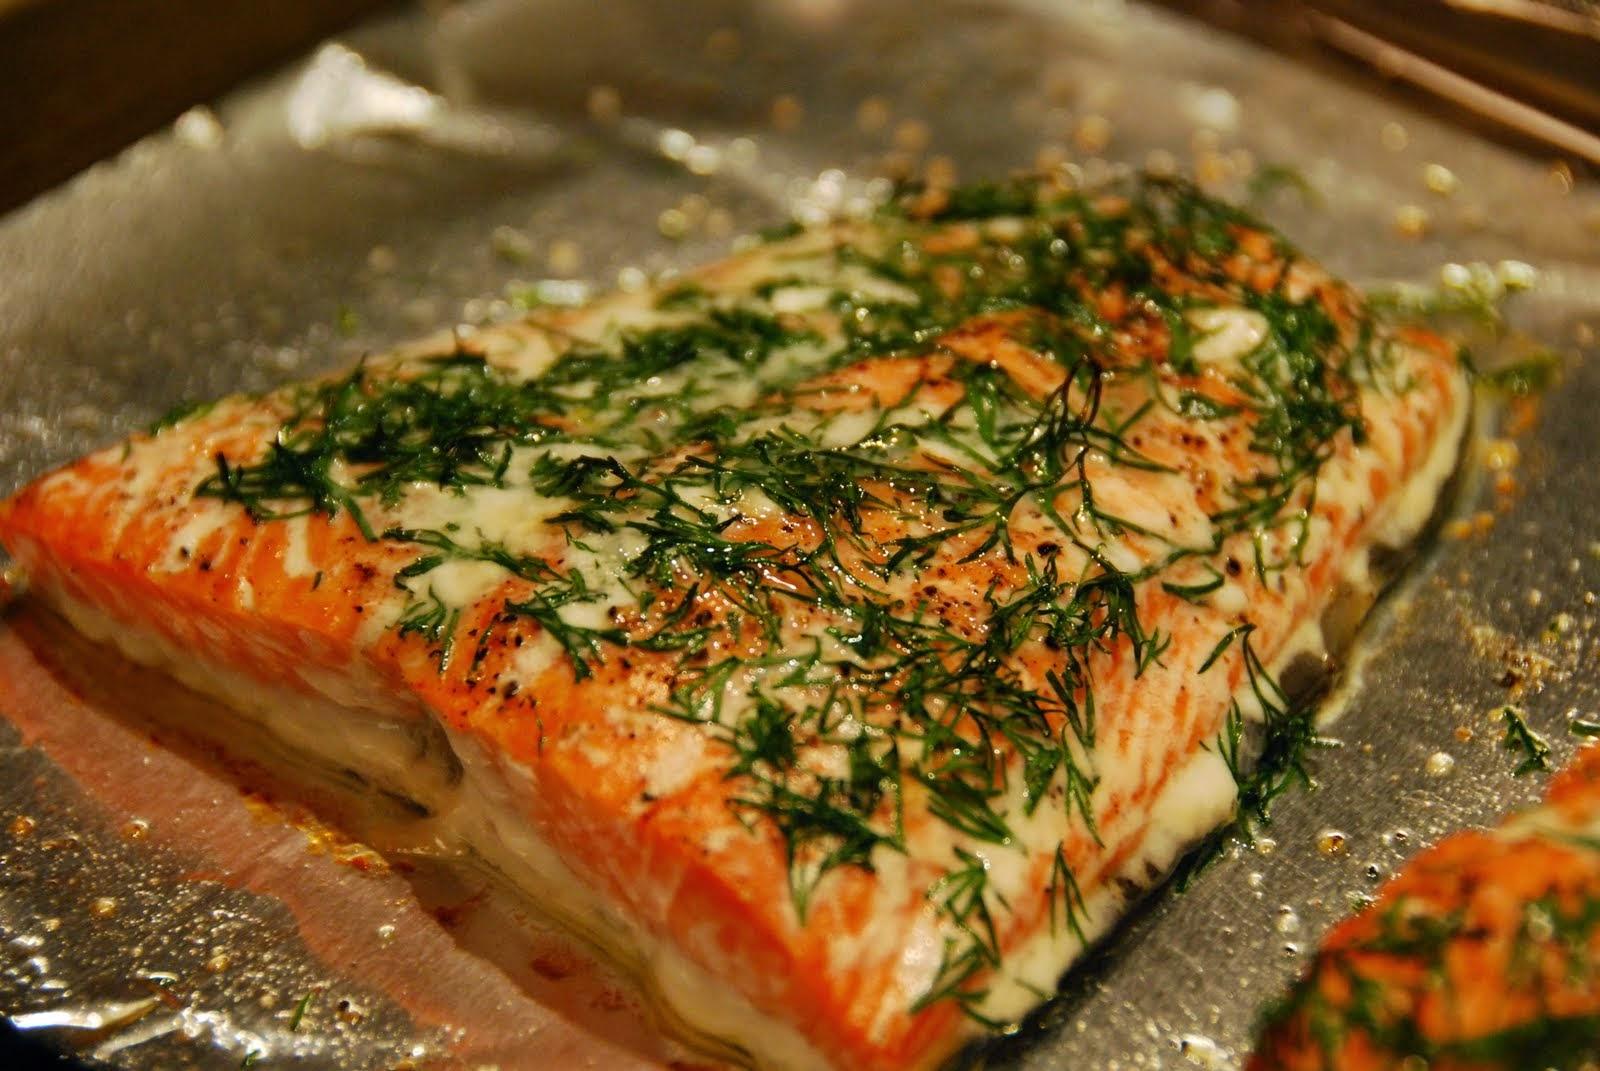 How To Bake Salmon